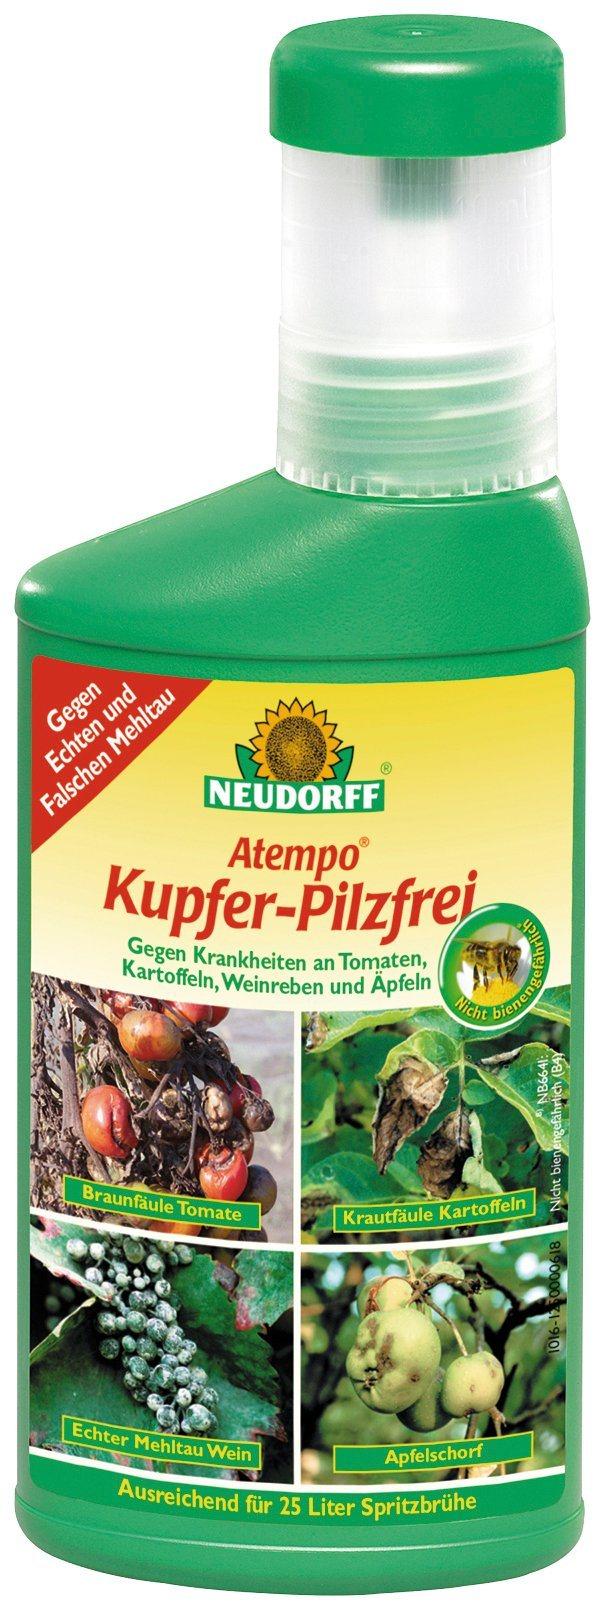 NEUDORFF Pflanzenschutz »Atempo Kupfer-Pilzfrei« | Garten > Pflanzen > Pflanzkästen | Neudorff